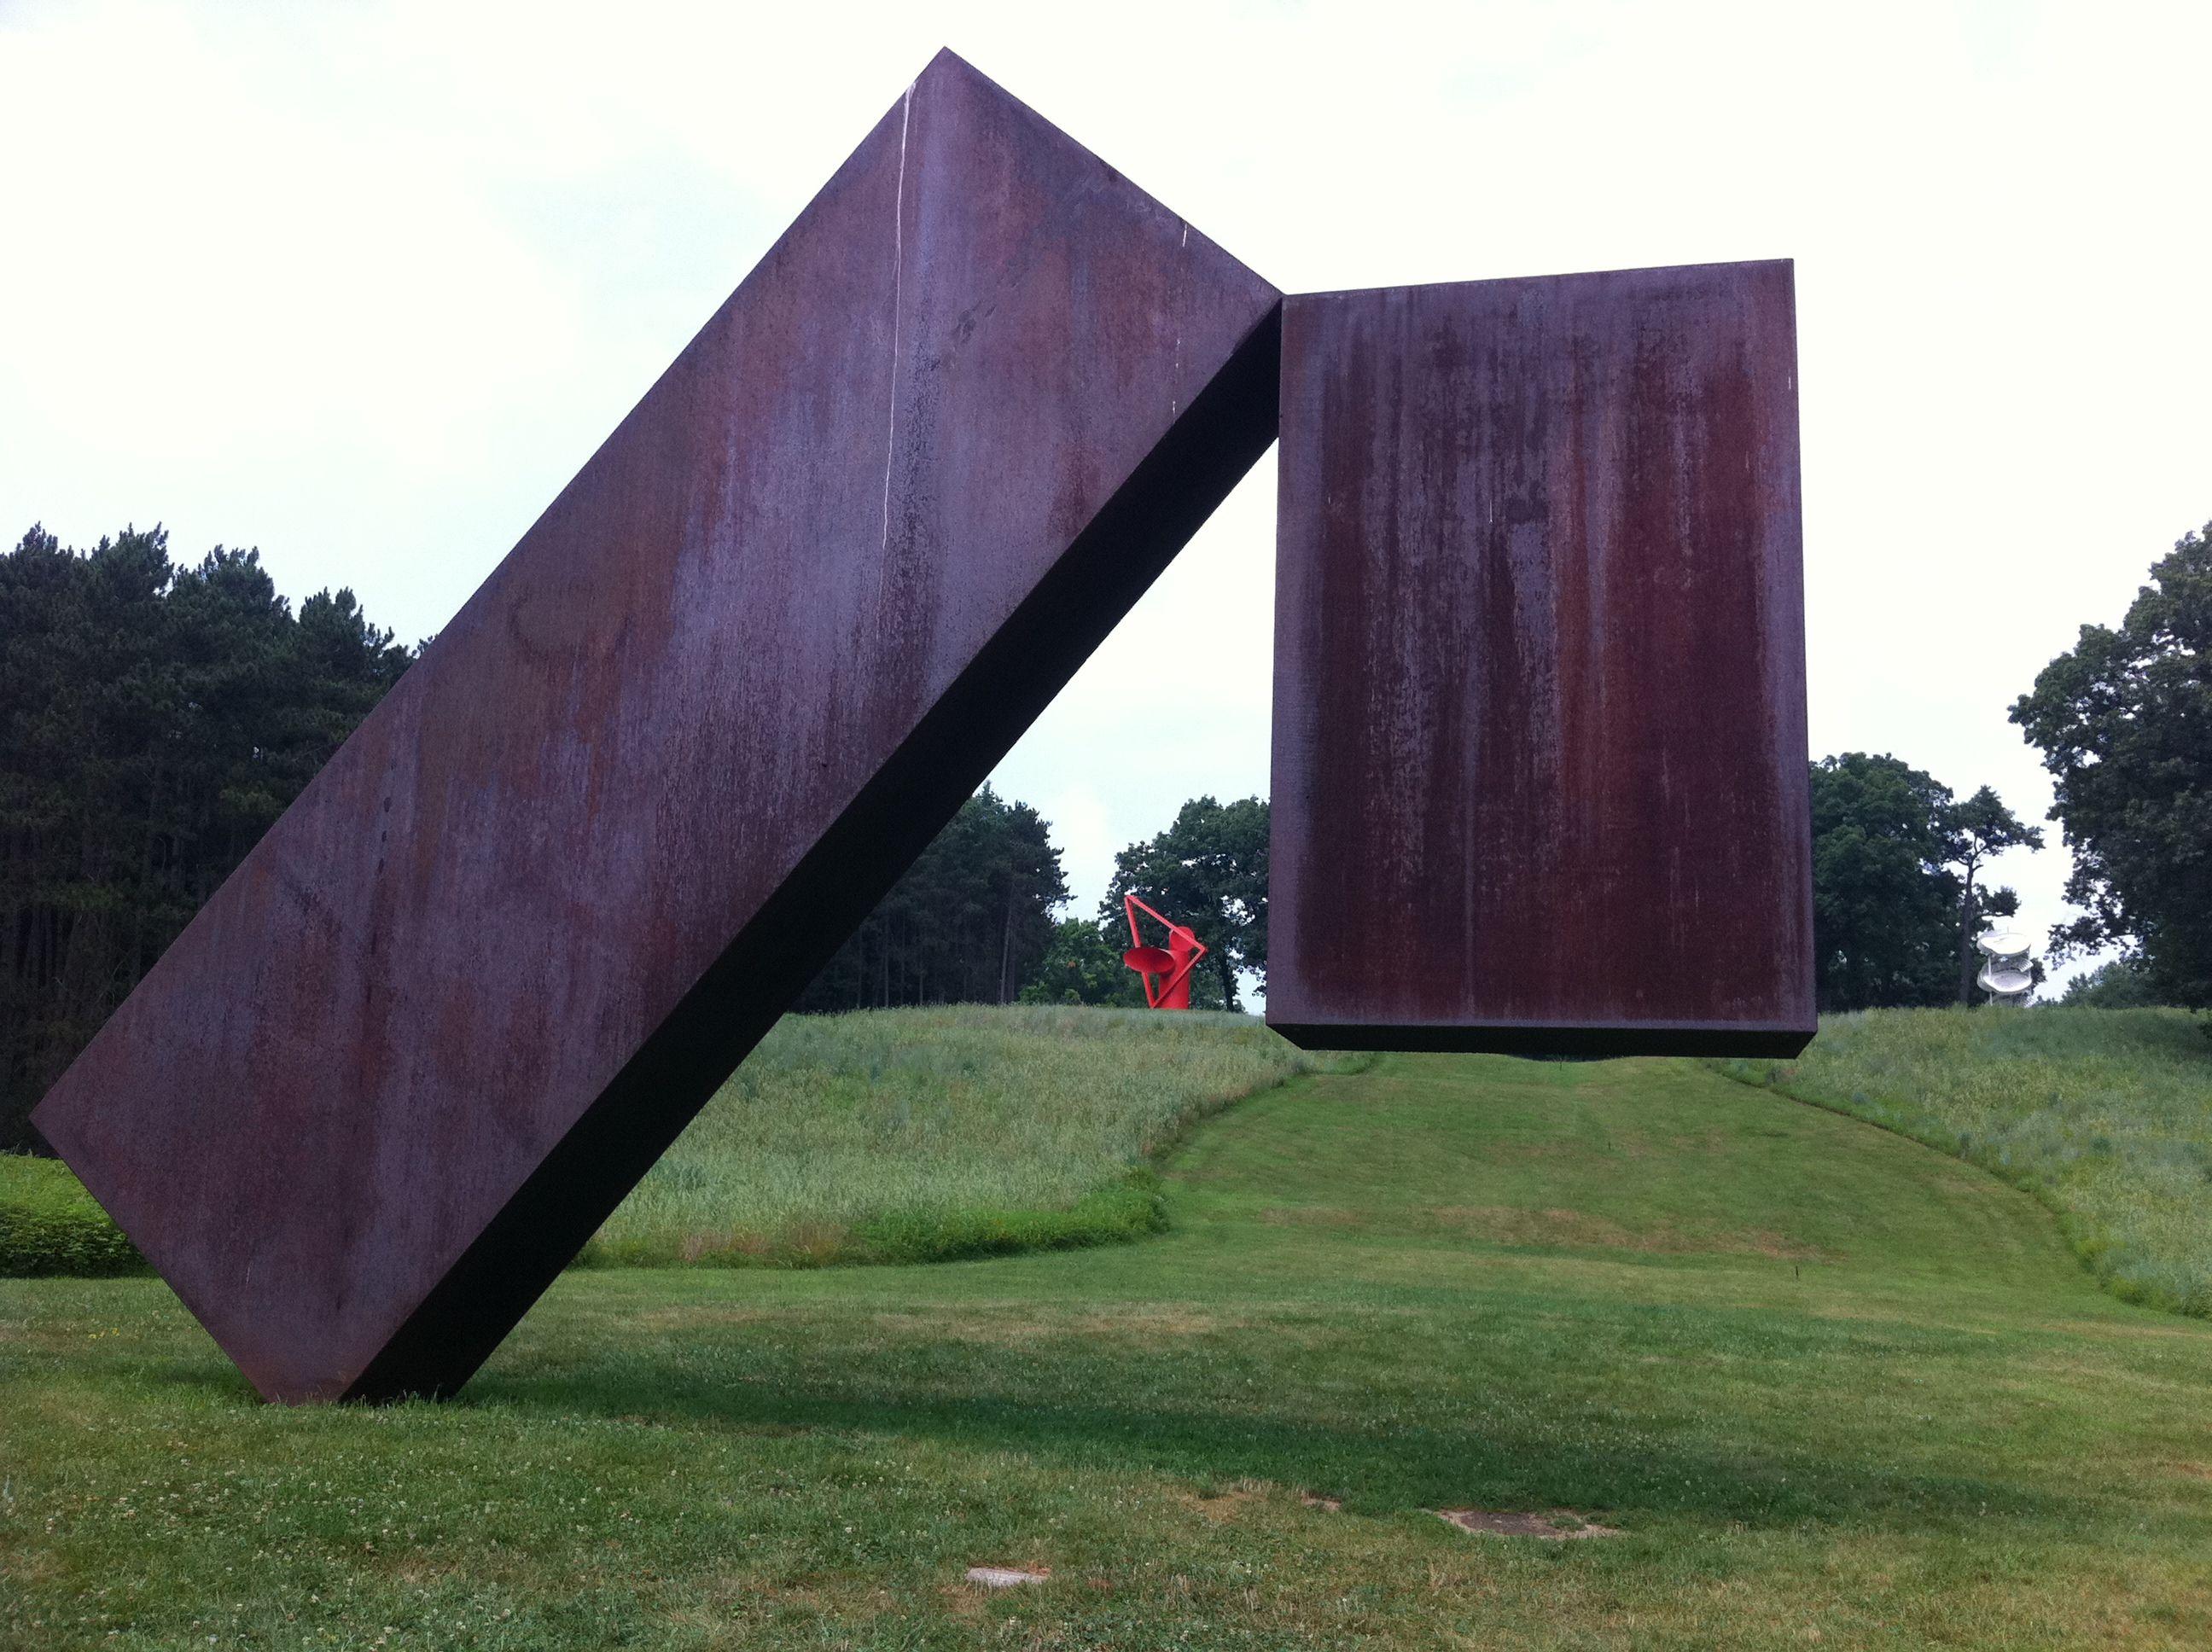 Isamu Noguchi Sculpture Garden Molti scultori   cringy   Pinterest ... for Isamu Noguchi Sculpture Garden  83fiz